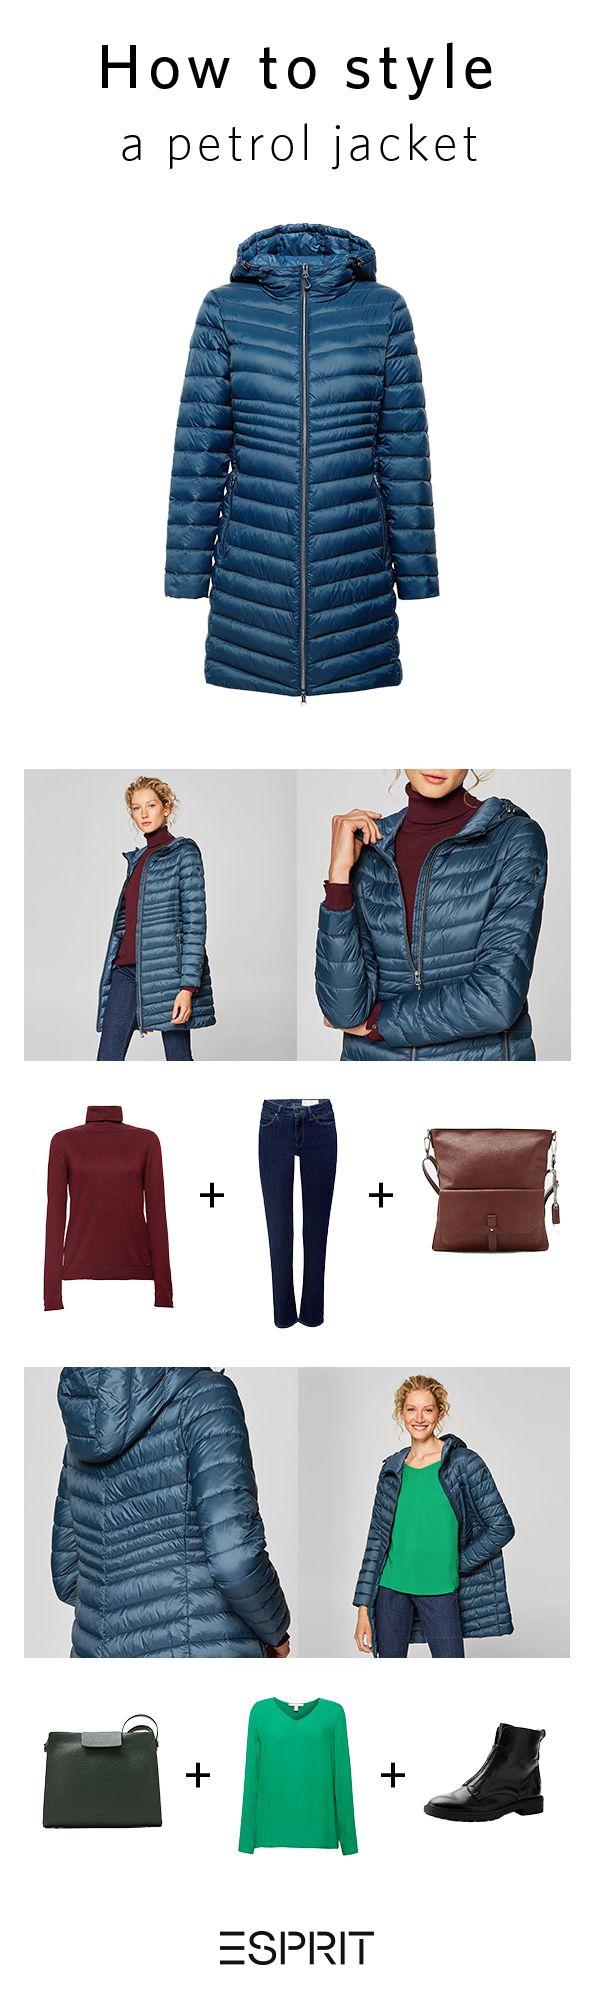 Esprit Outerwear Petrol Coat Outfit Coats For Women Clothes Favorite Outfit [ 2001 x 595 Pixel ]